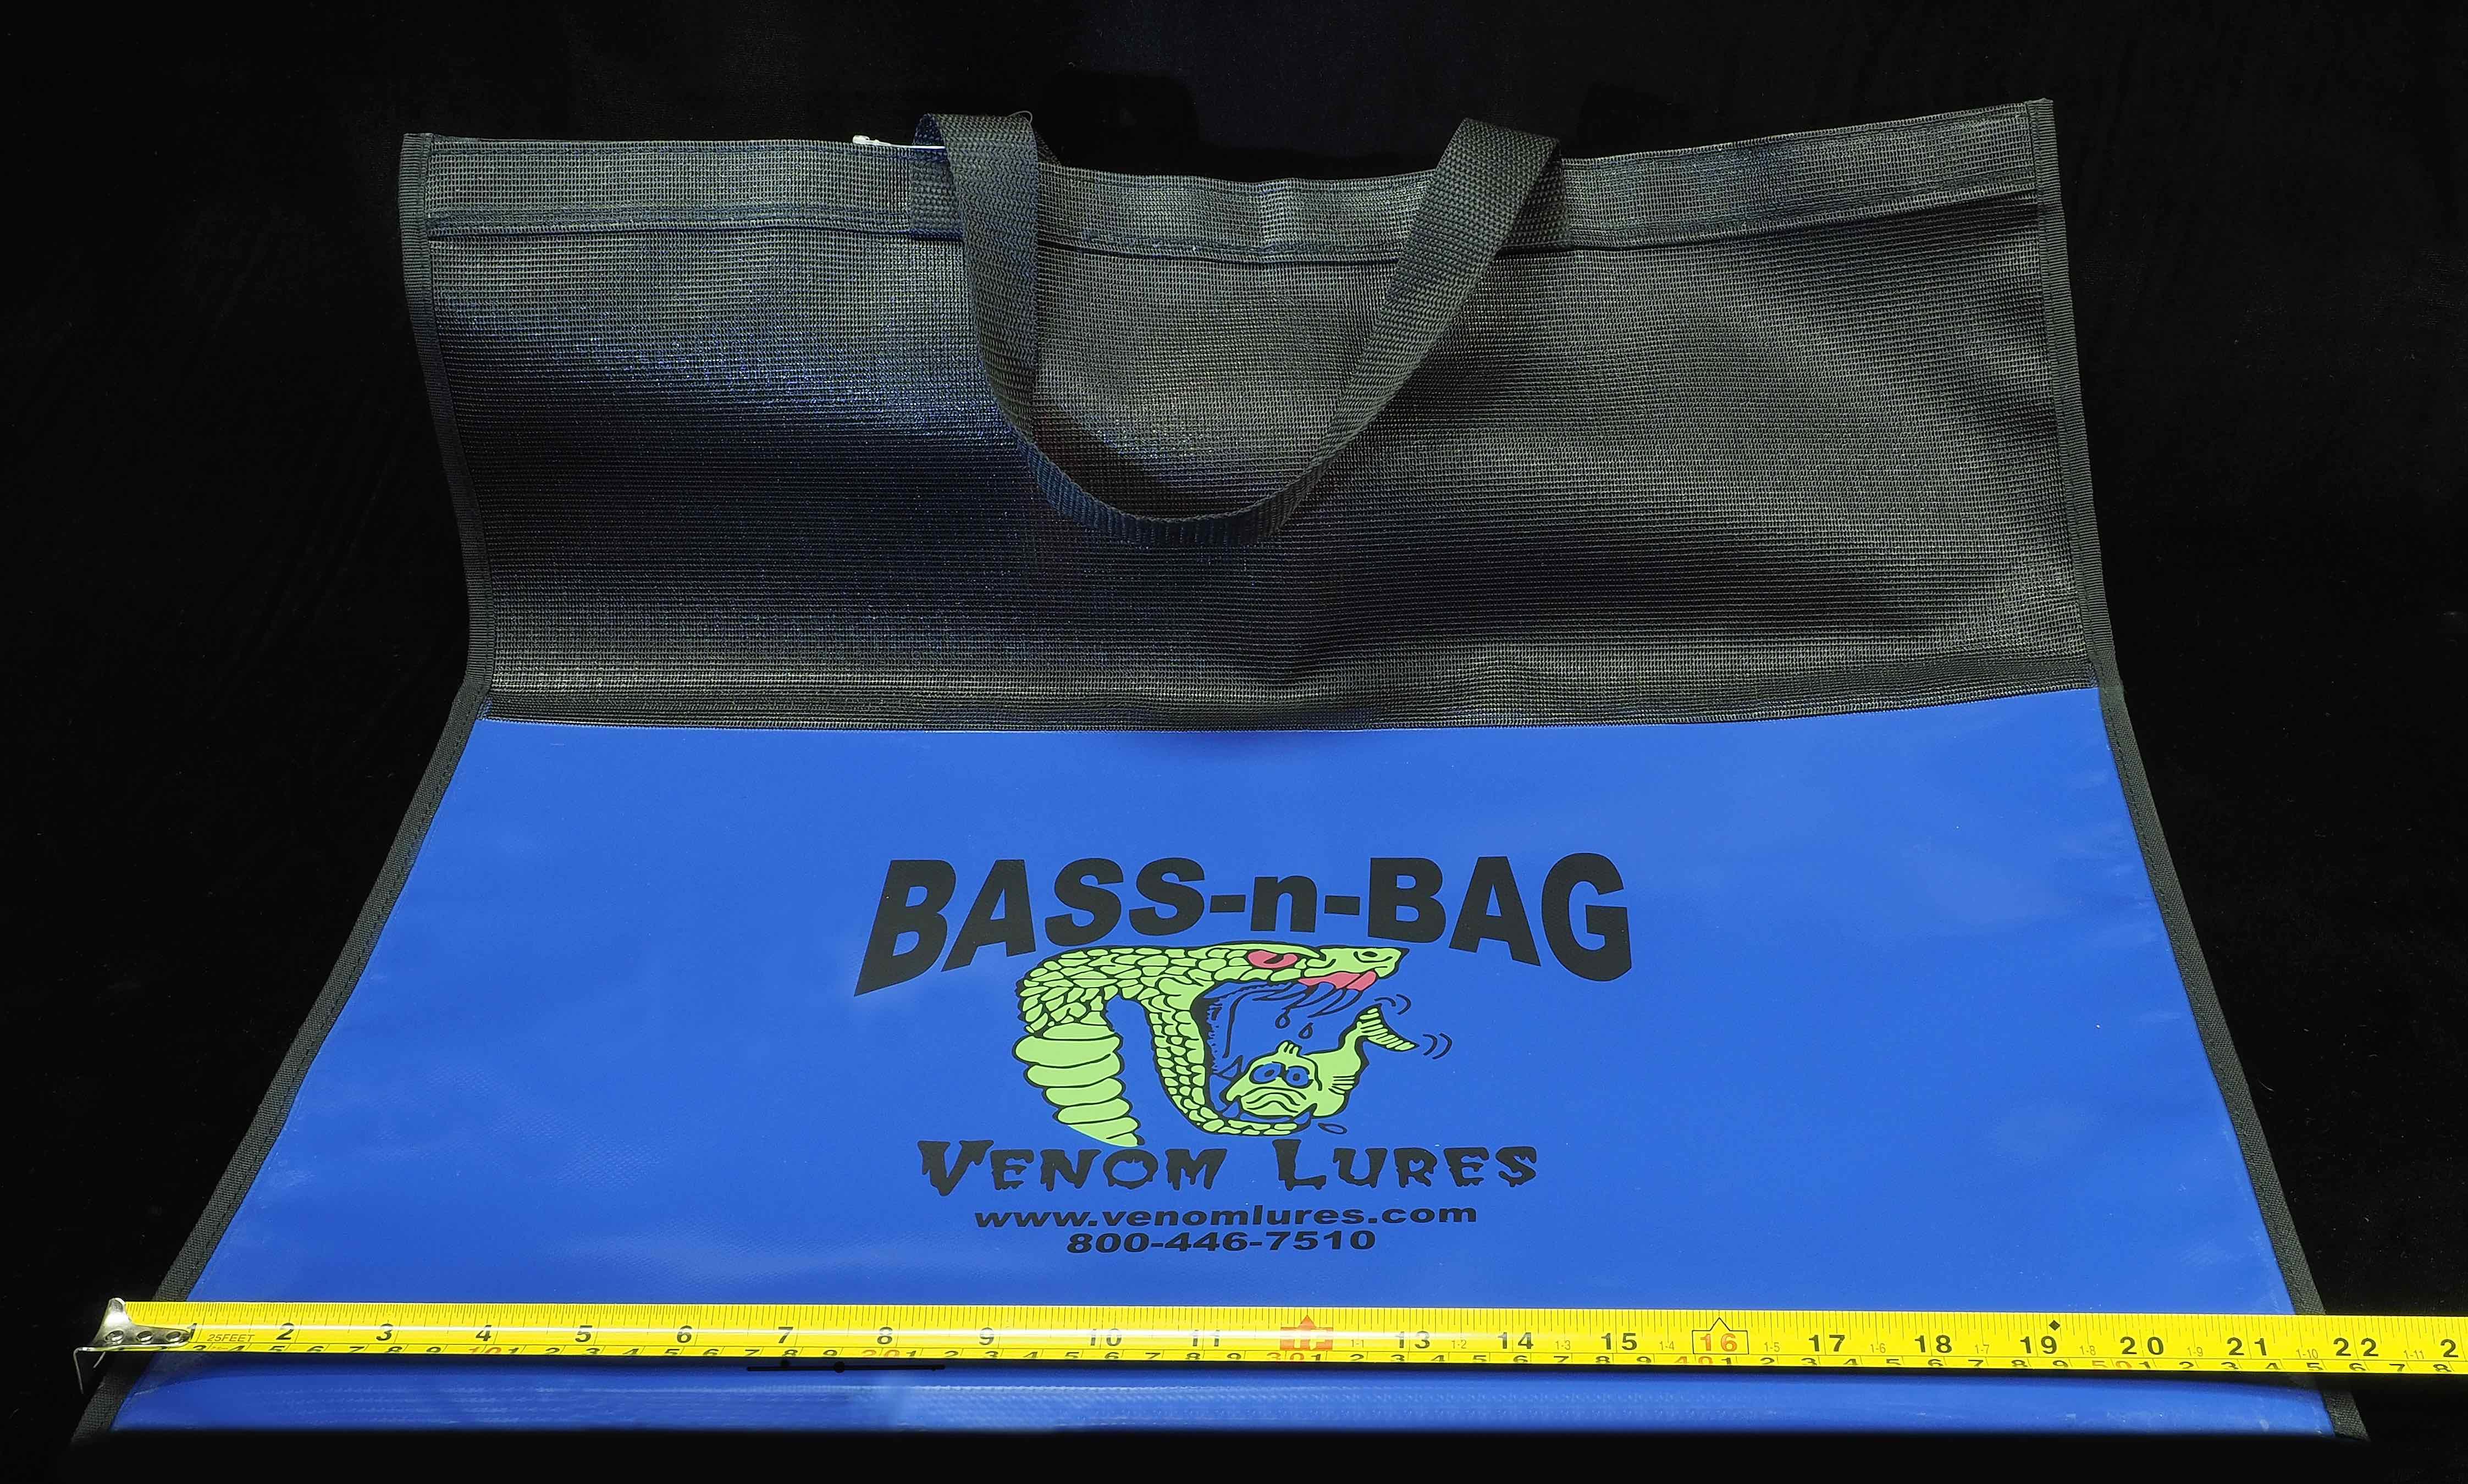 Venom Lures Bass-N-Bag Bass Tournament Weigh-Bag